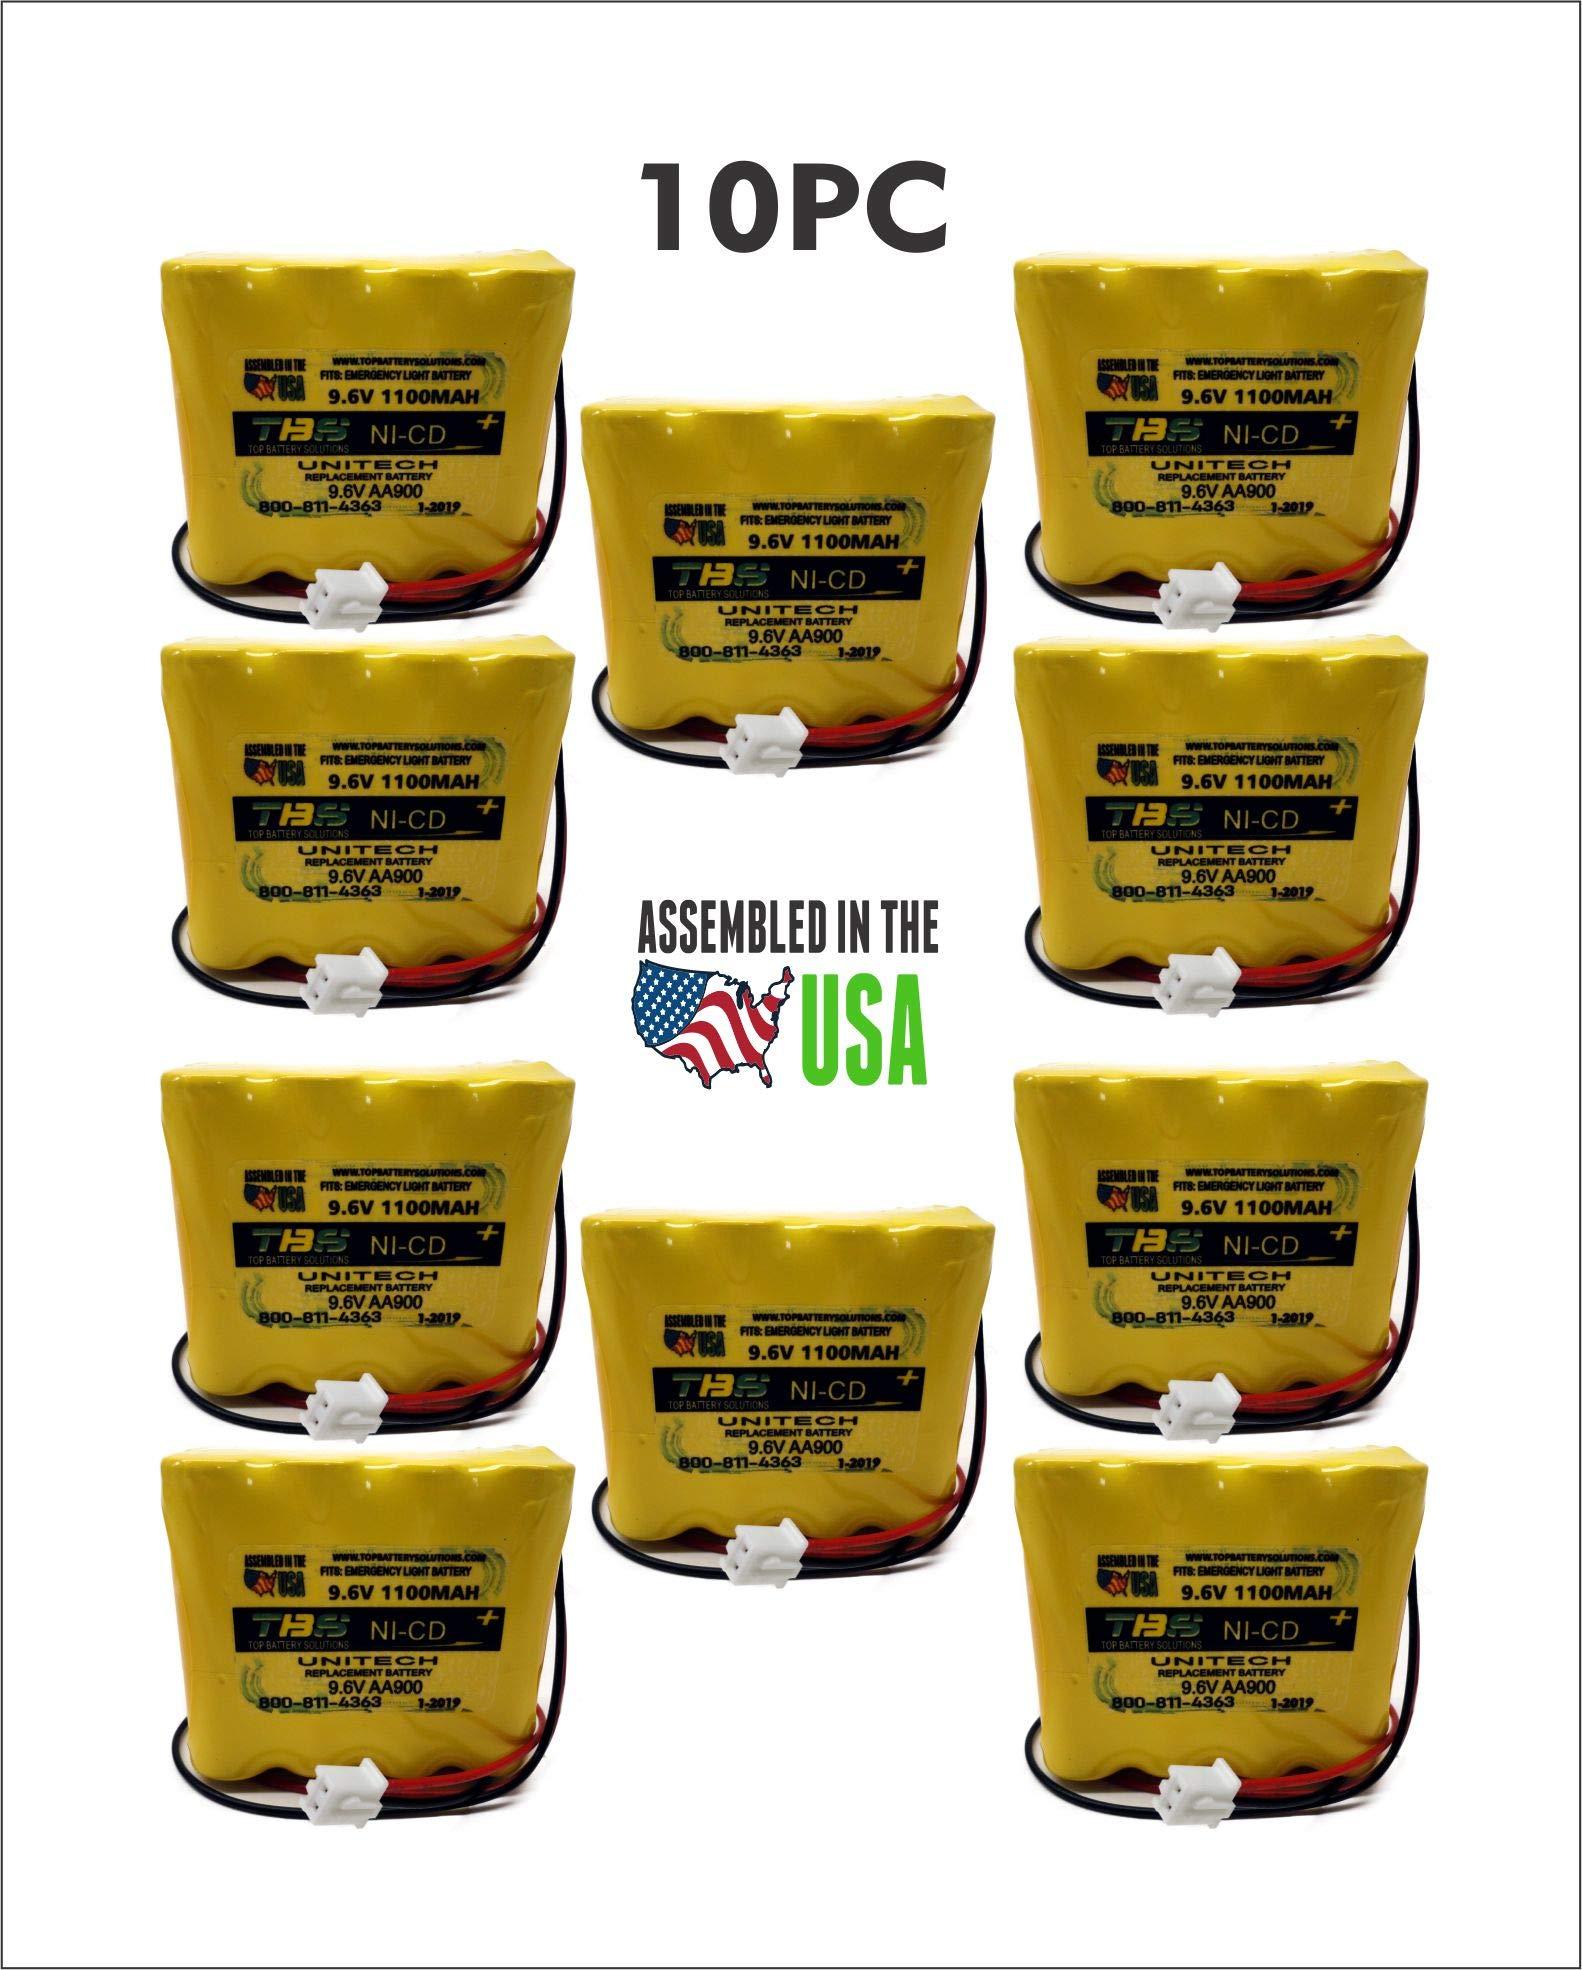 10PC Unitech AA900mAh 9.6V Battery Emergency Light 9.6V 1.1Ah NiCD